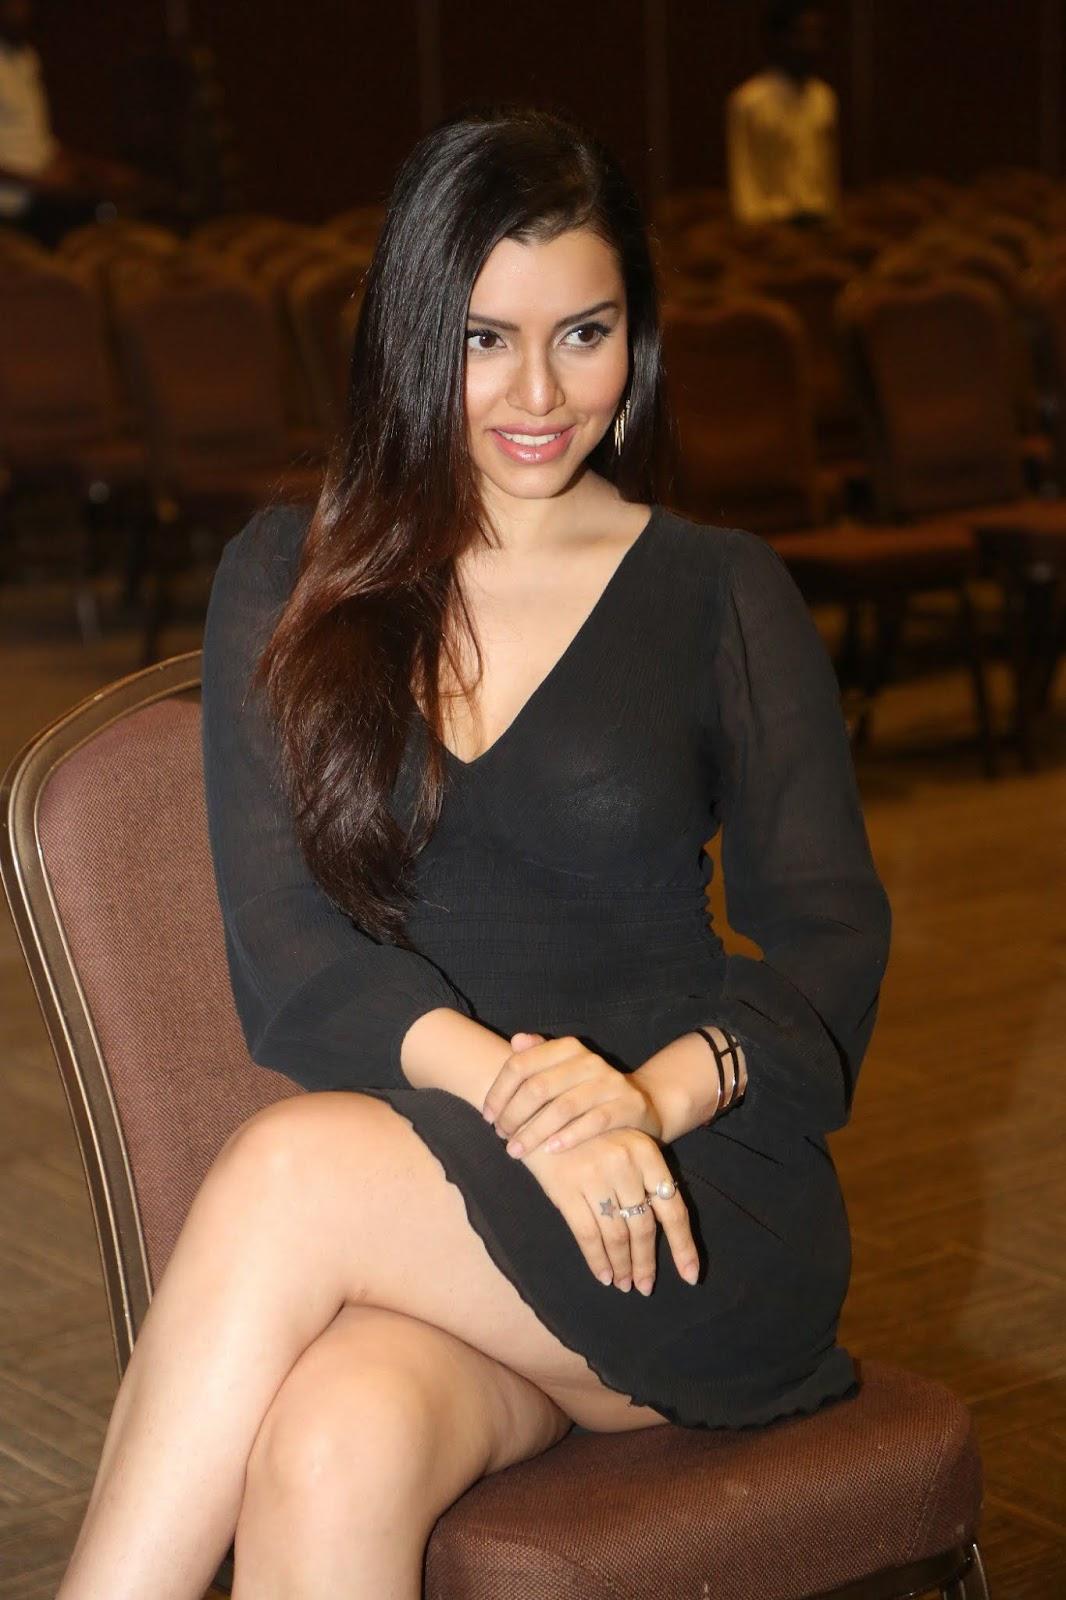 Kyra Dutt in black mini frock skirt sitting crossed legs on a chair